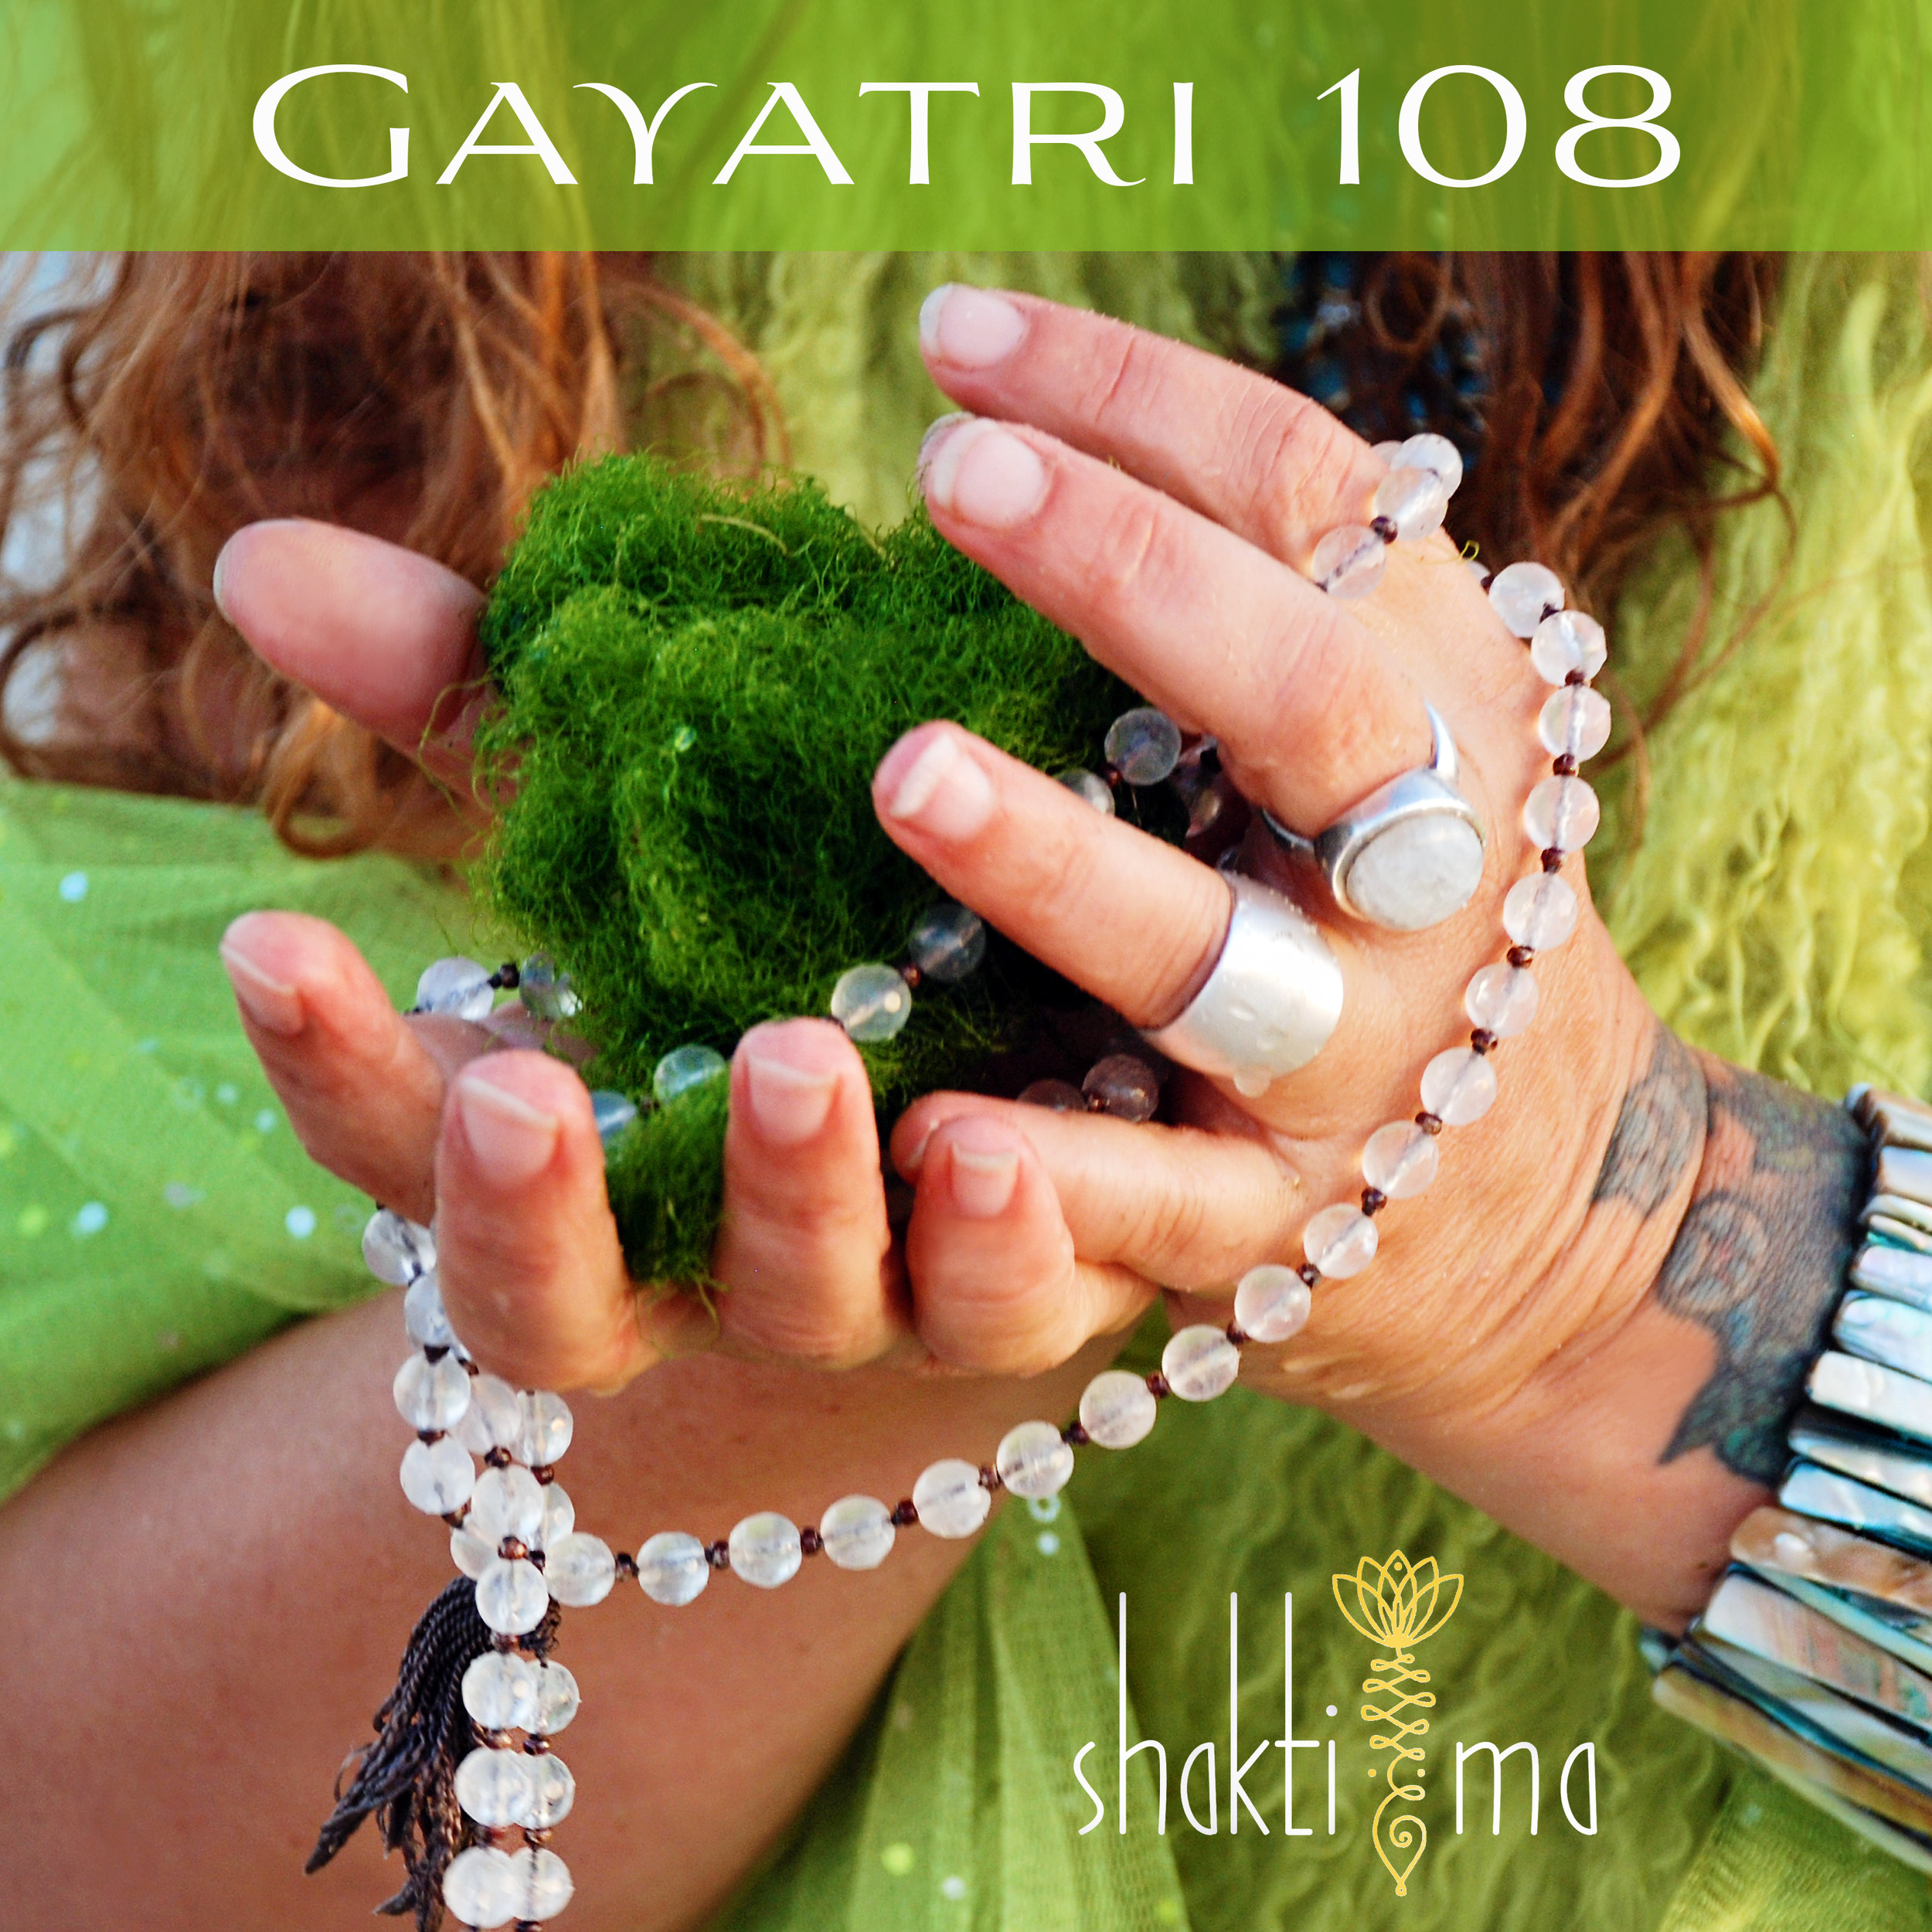 barbara gayatri 108 square for cd baby.jpg